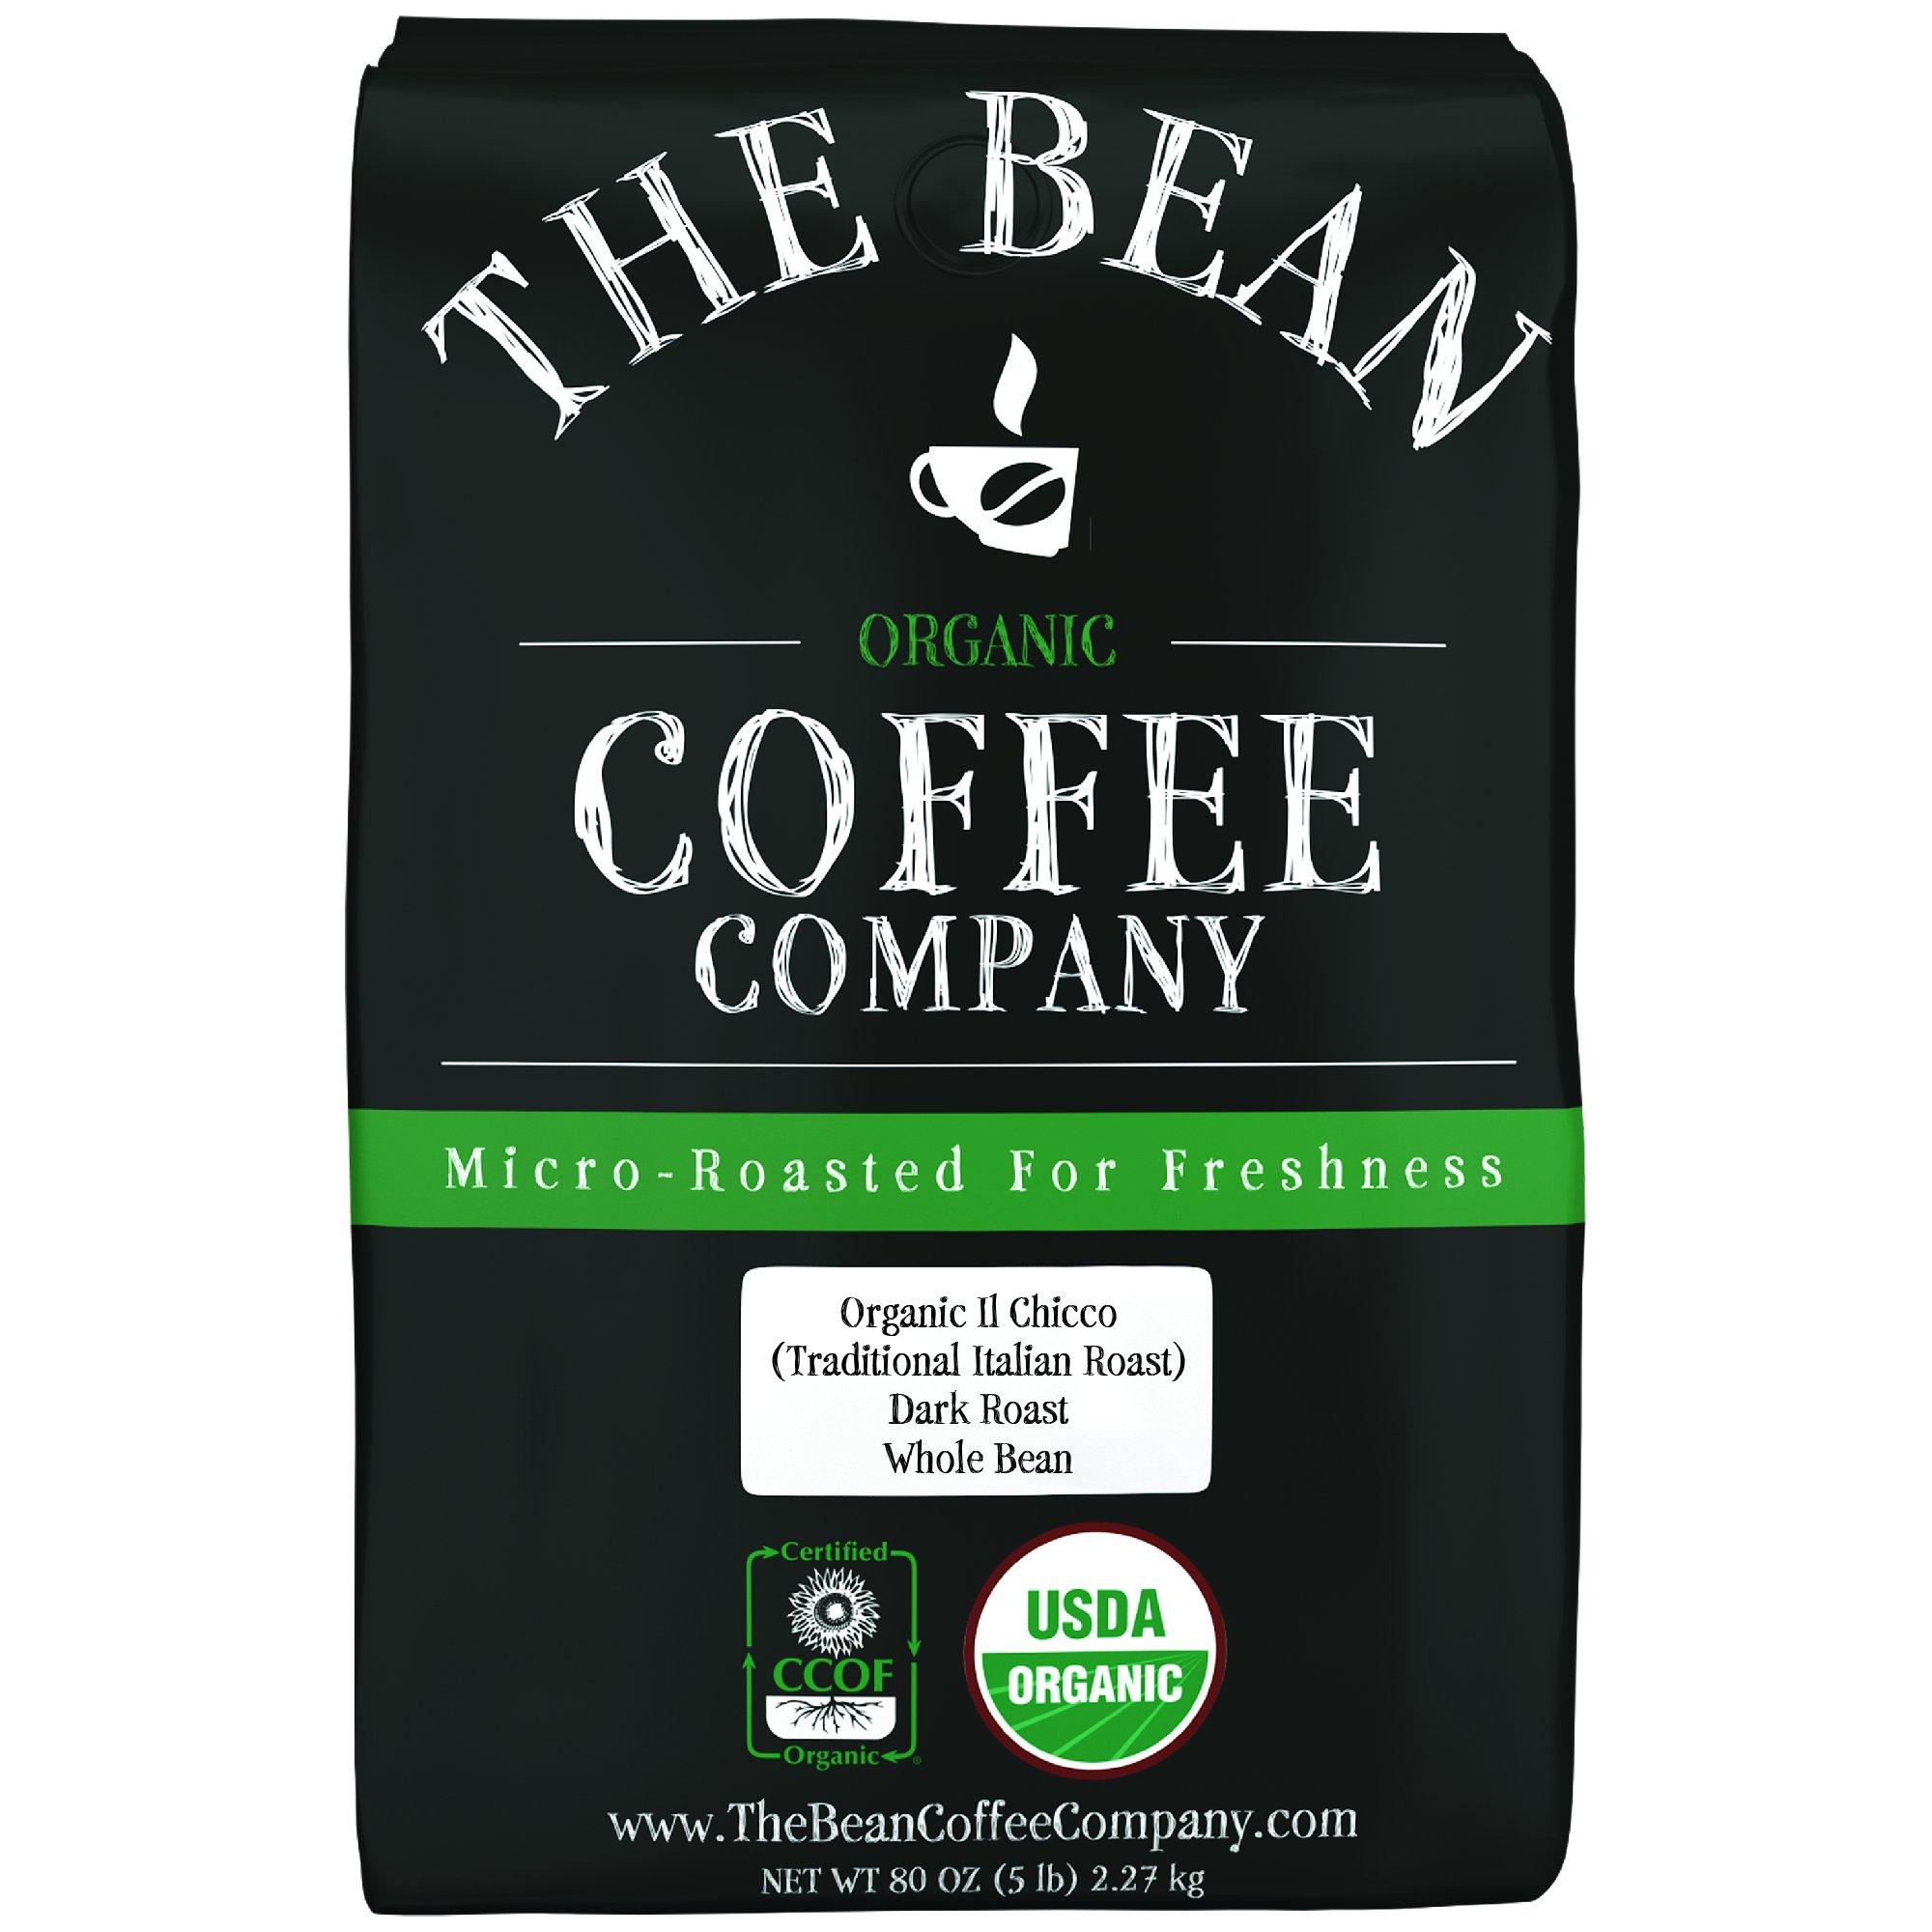 The Bean Coffee Company Organic Il Chicco (Traditional Italian Roast), Dark Roast, Whole Bean, 5-Pound Bag